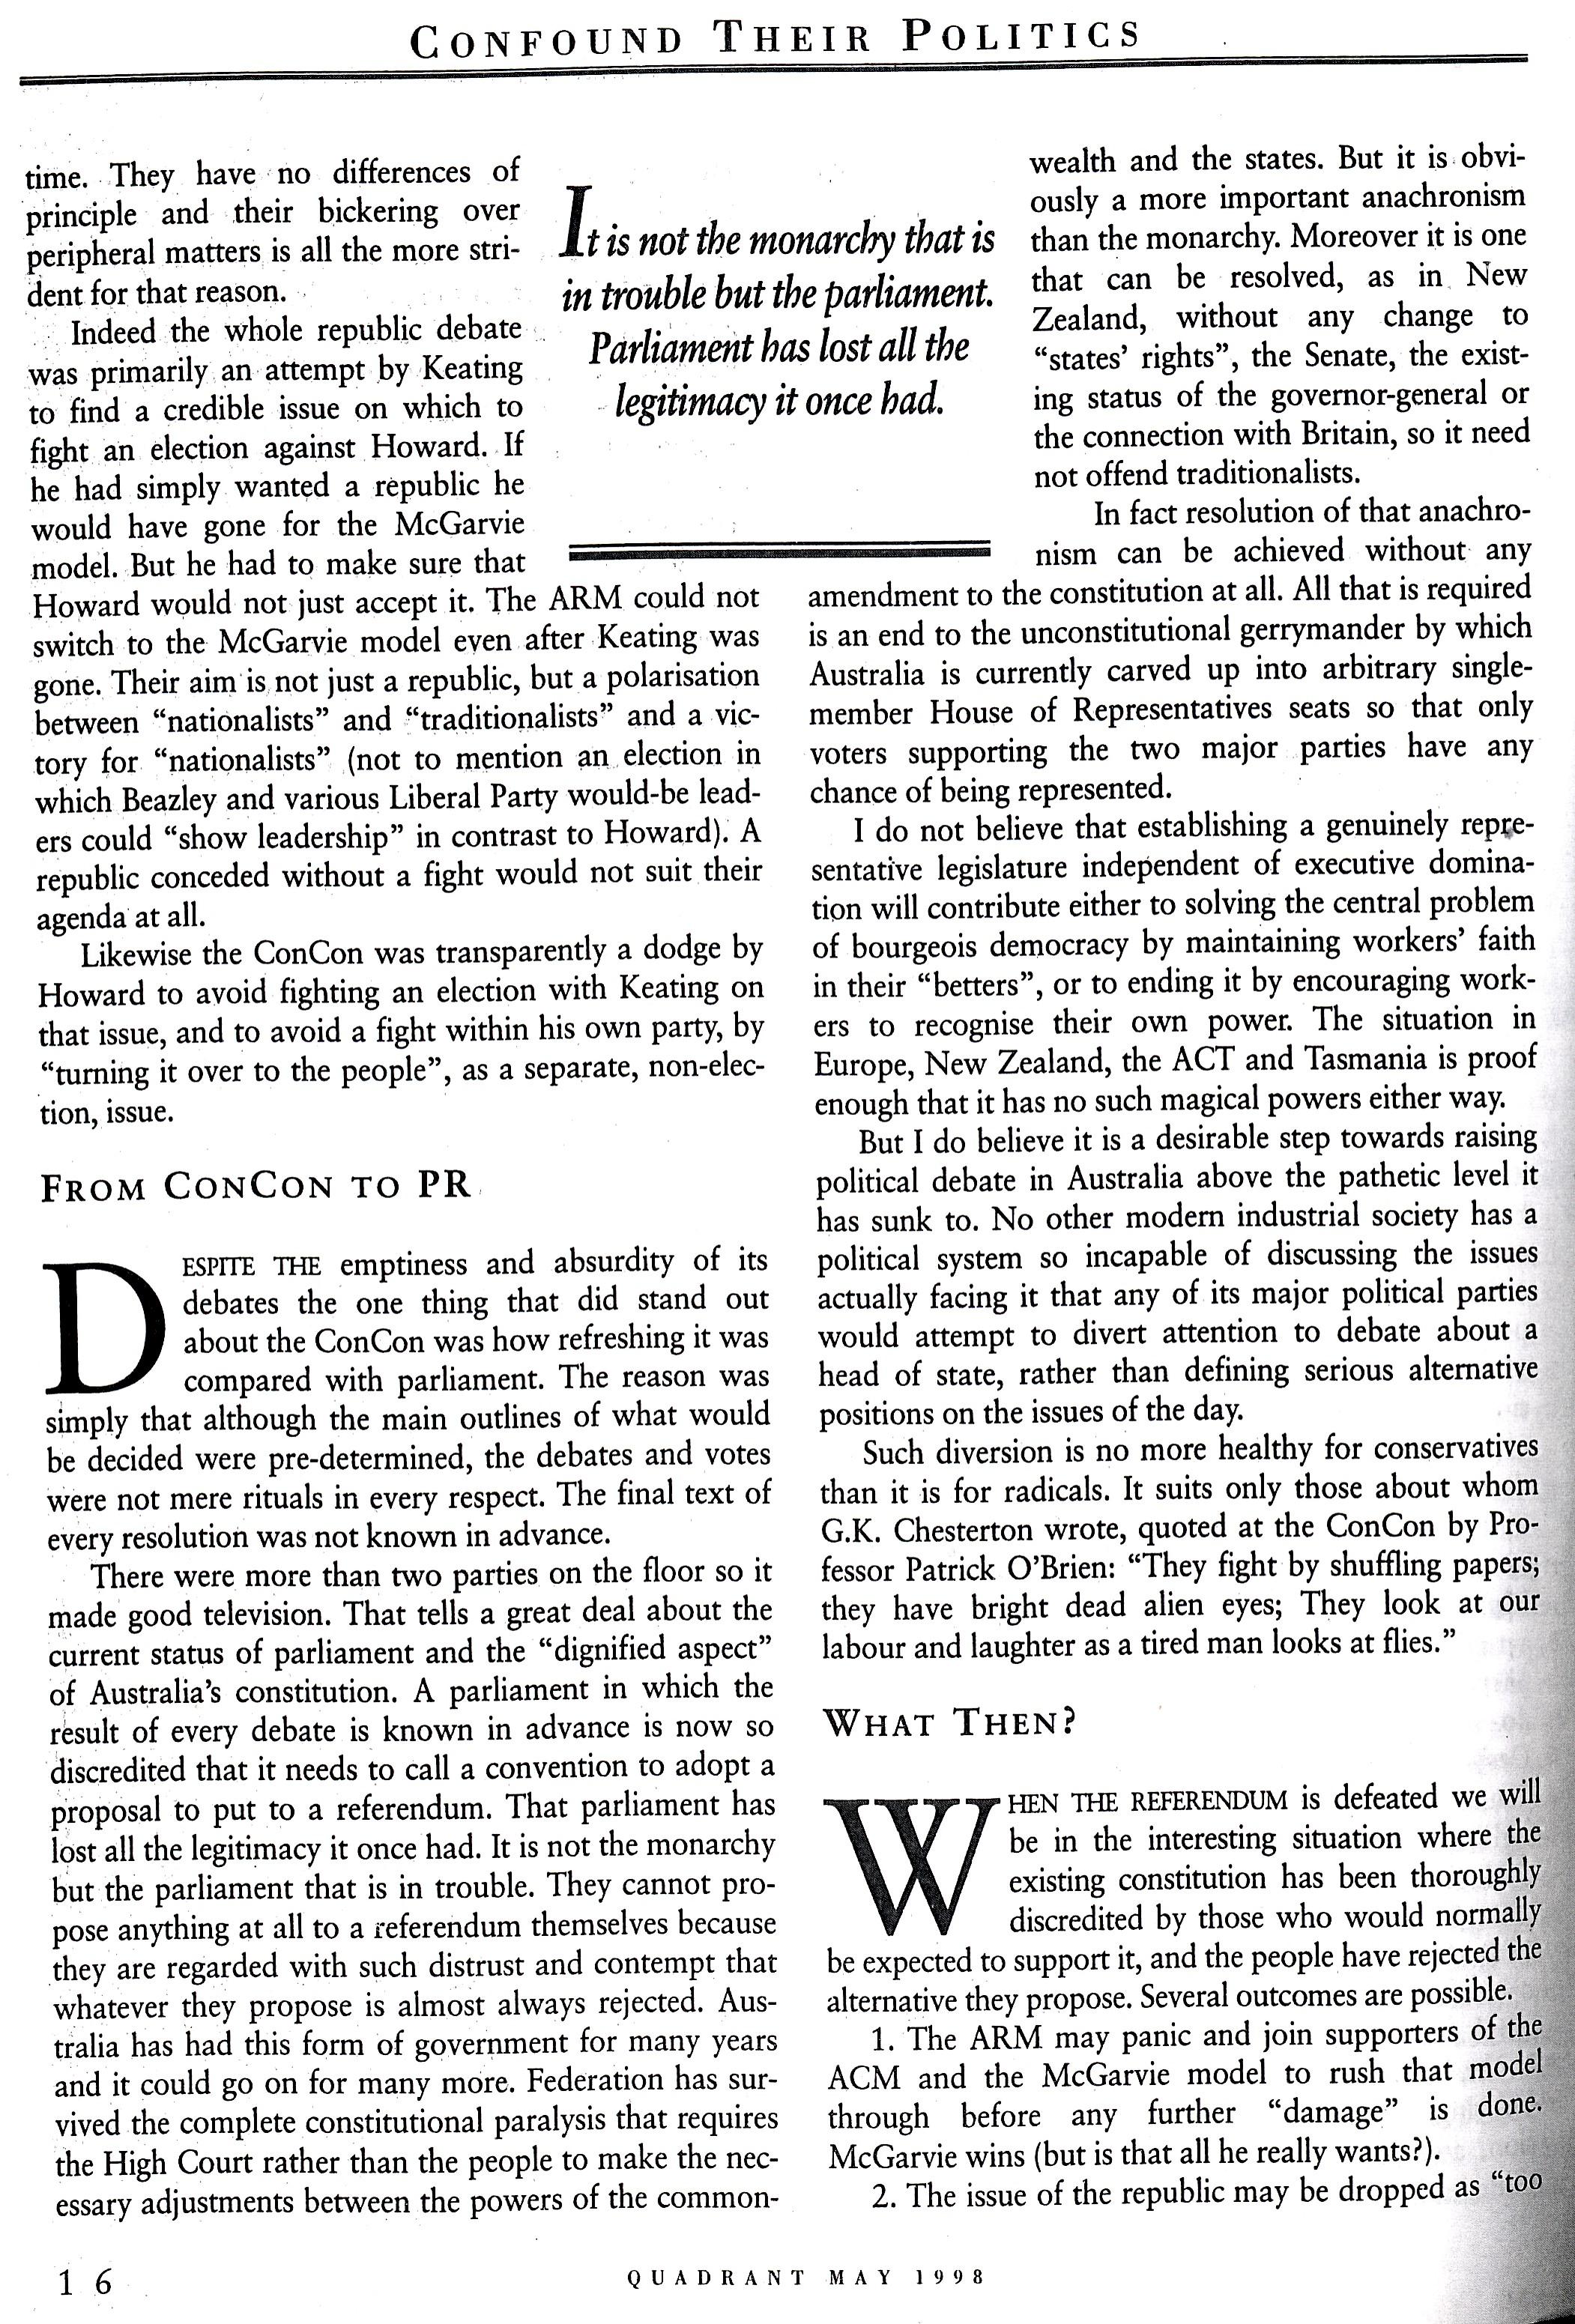 Albert Langer Confound their politics Quadrant May 1998_7